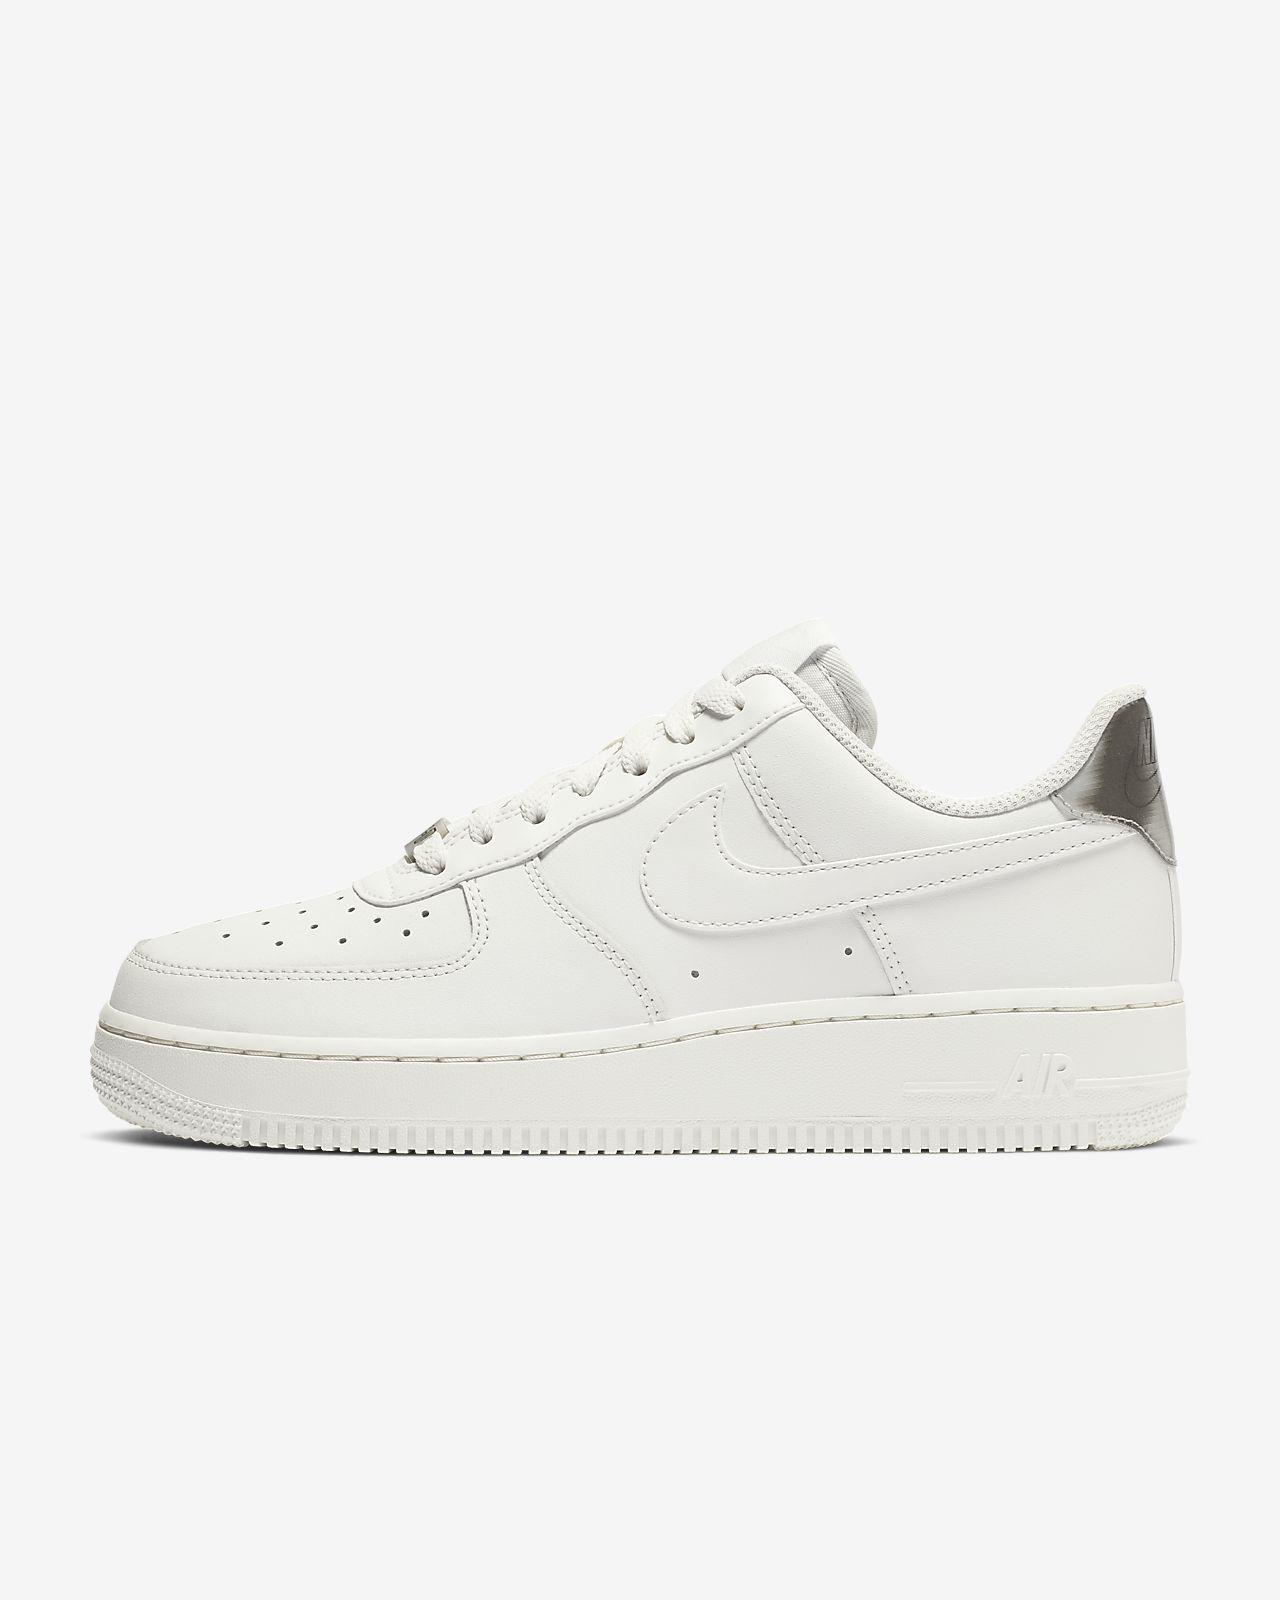 buy online a82ff 0d2ae ... Sko Nike Air Force 1  07 Essential för kvinnor